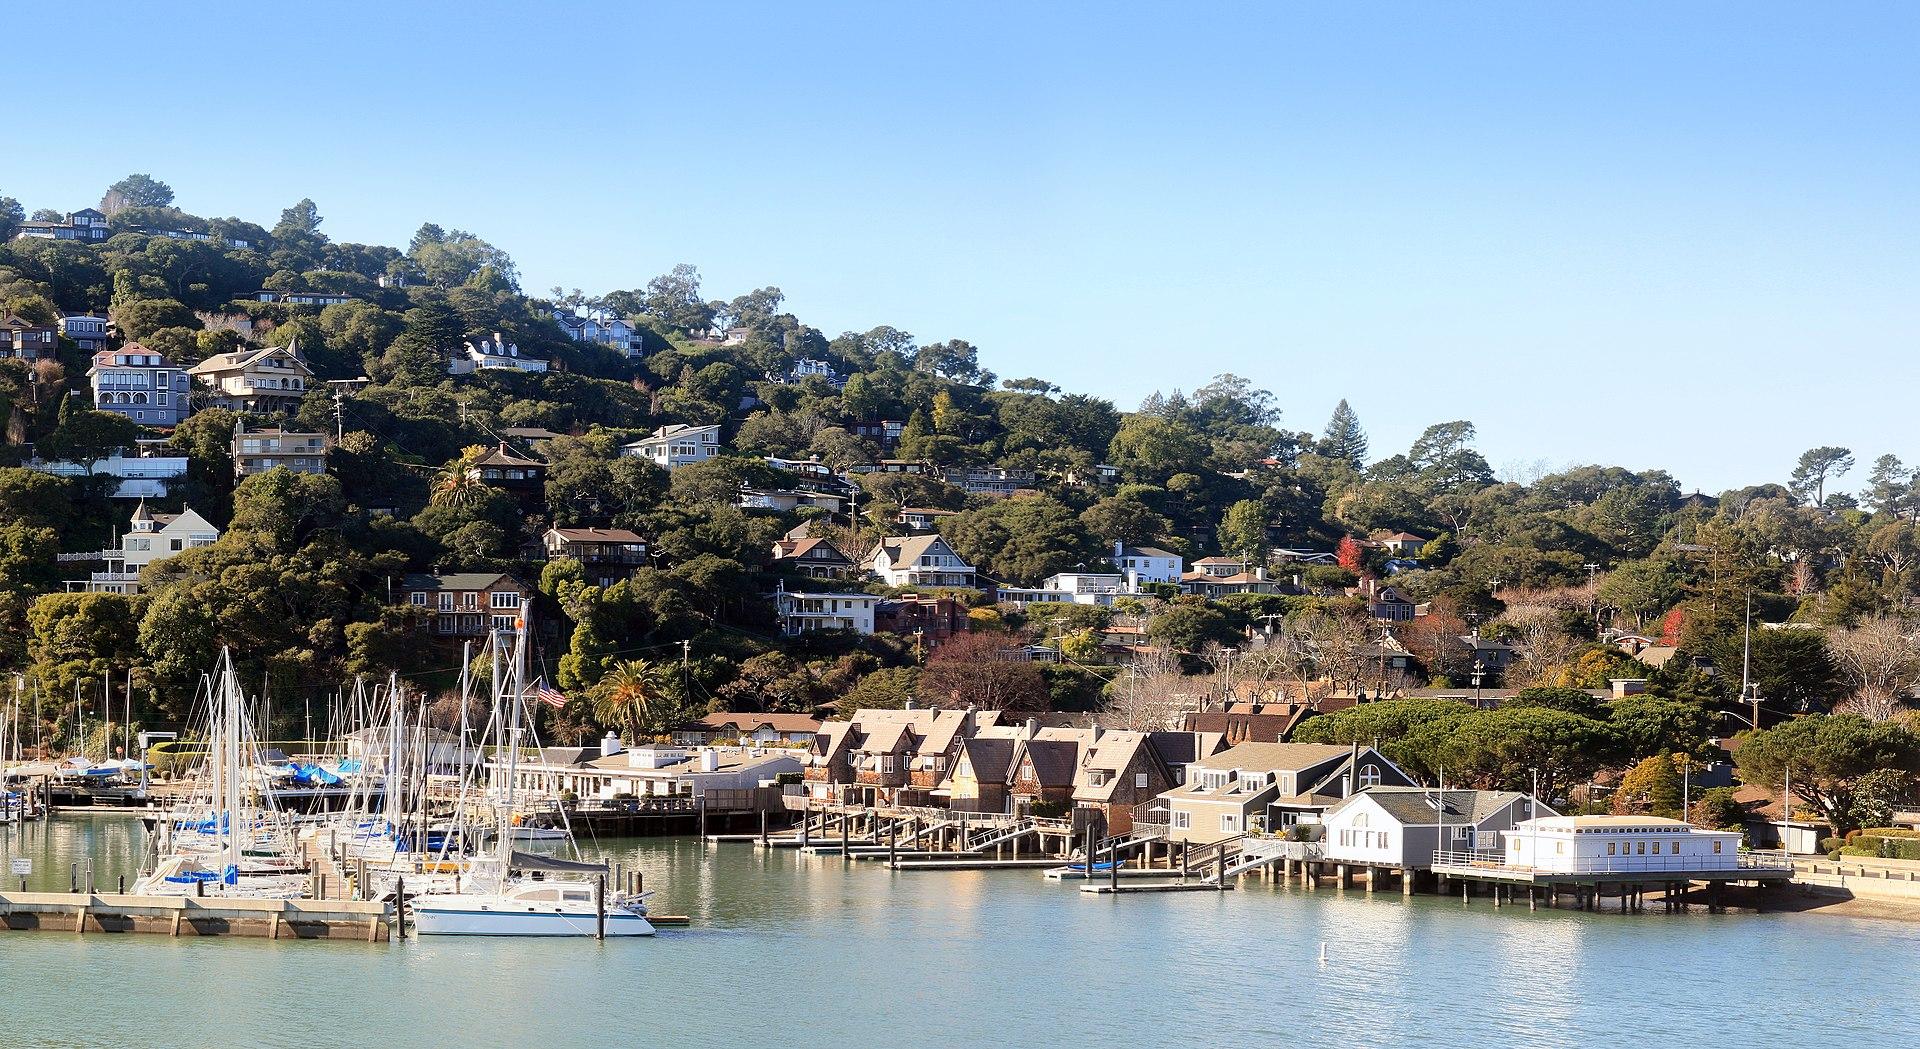 James Island Yacht Club Membership